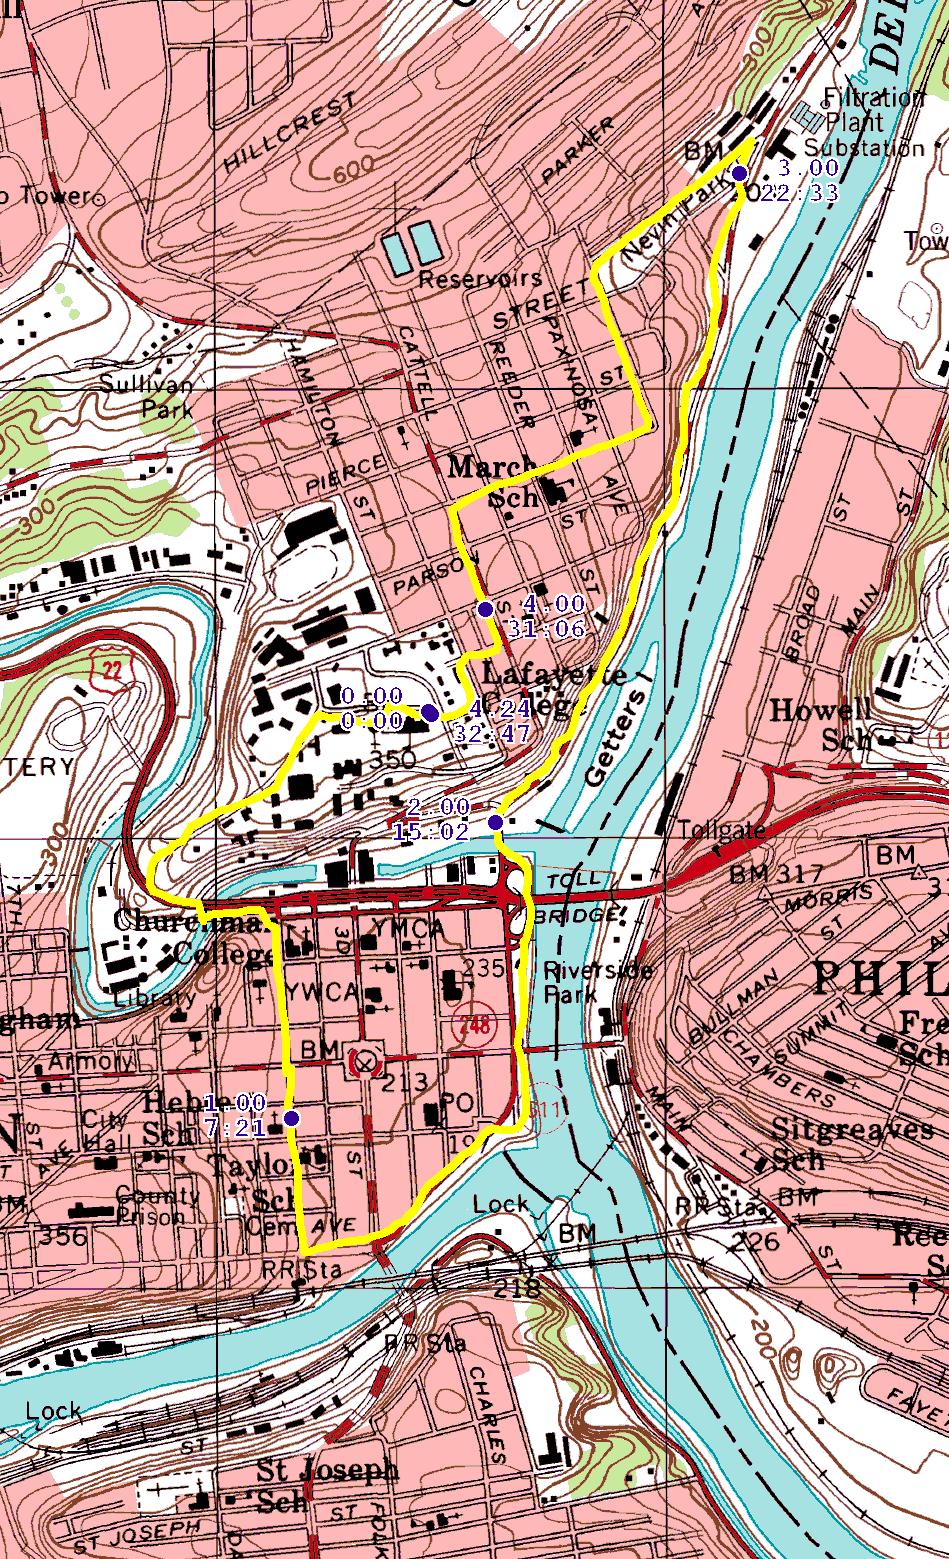 lehigh and delaware rivers meet at